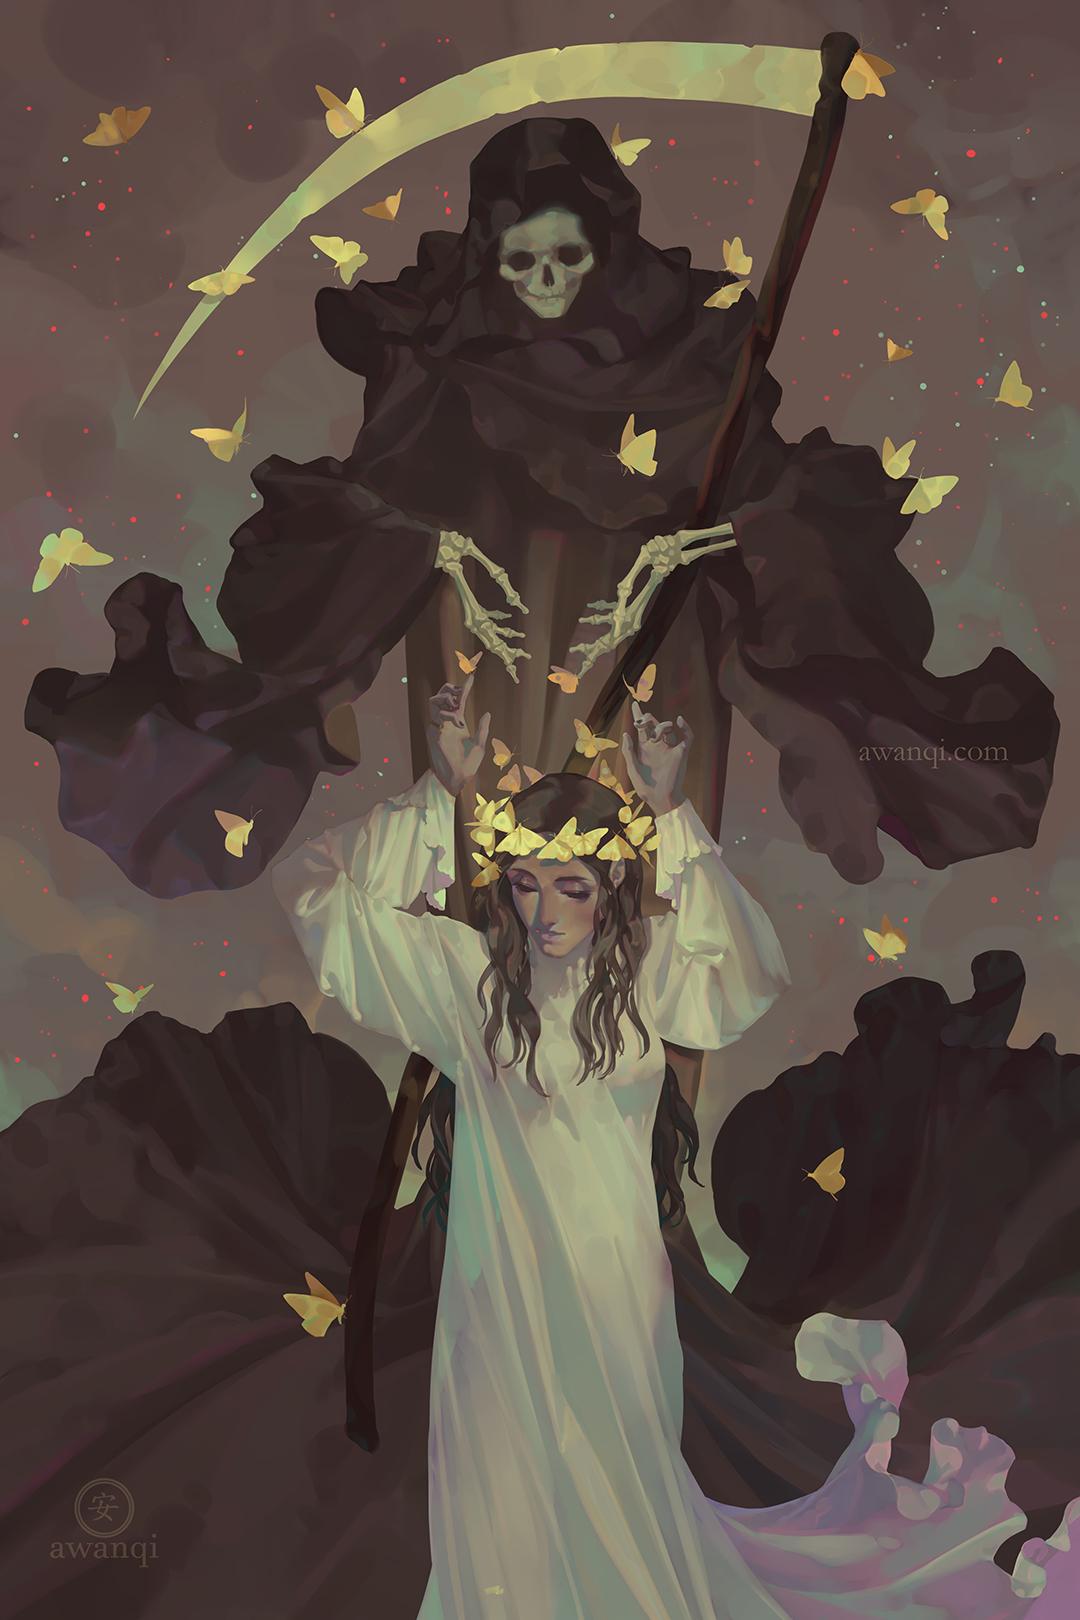 Girlsclubasia-Artist-Illustrator-Angela Wang-crown of souls internet